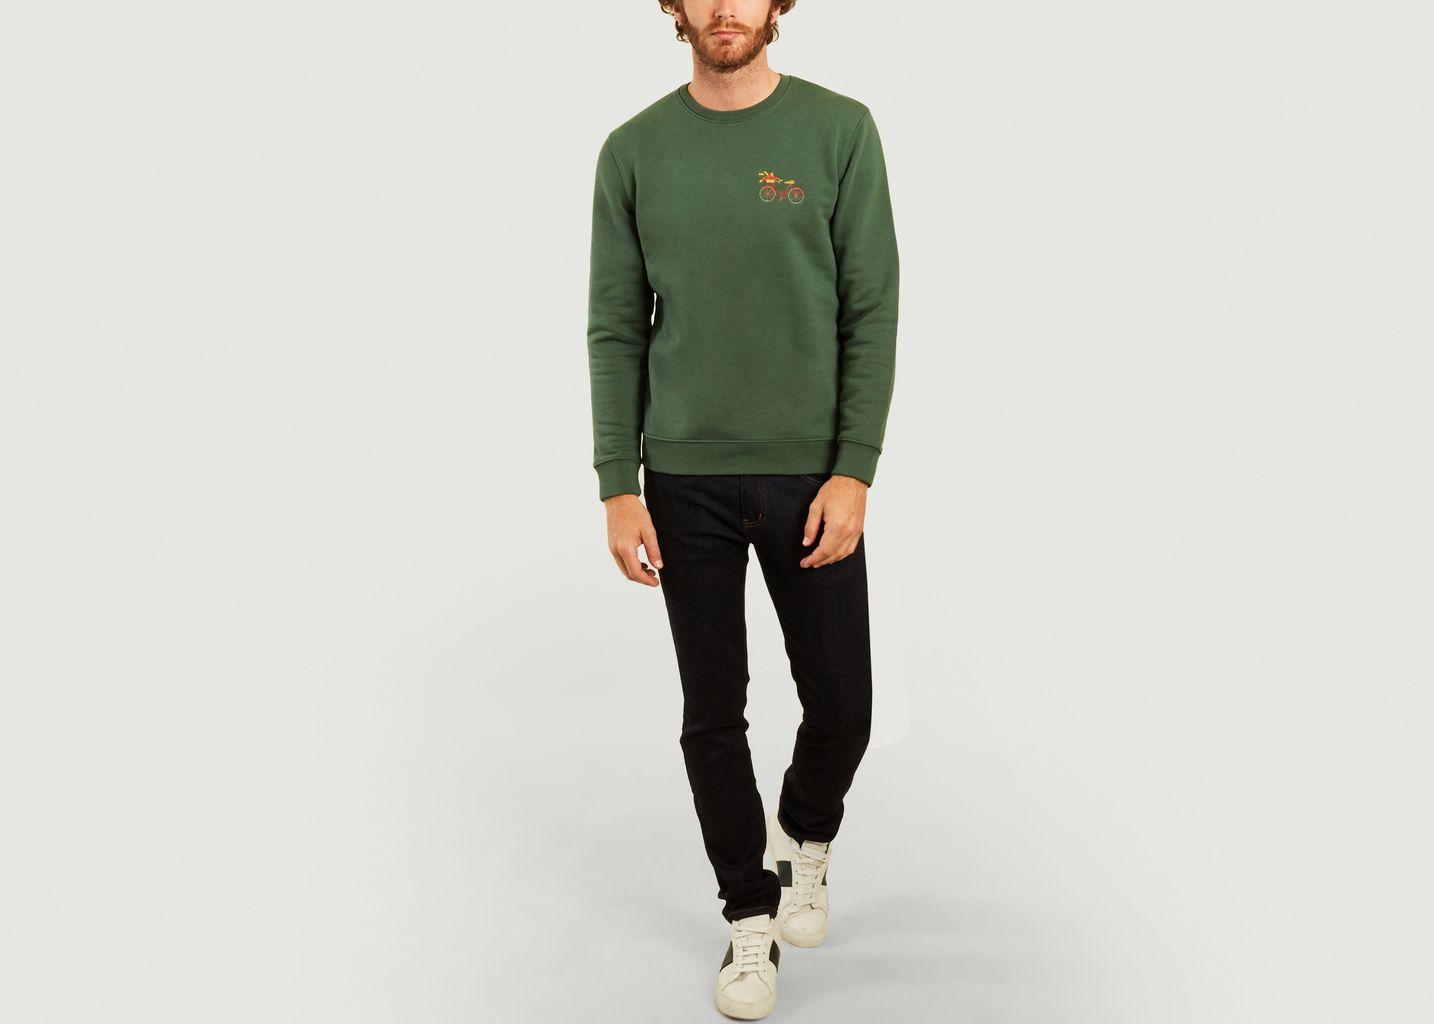 Sweatshirt brodé Vélo - Johnny Romance